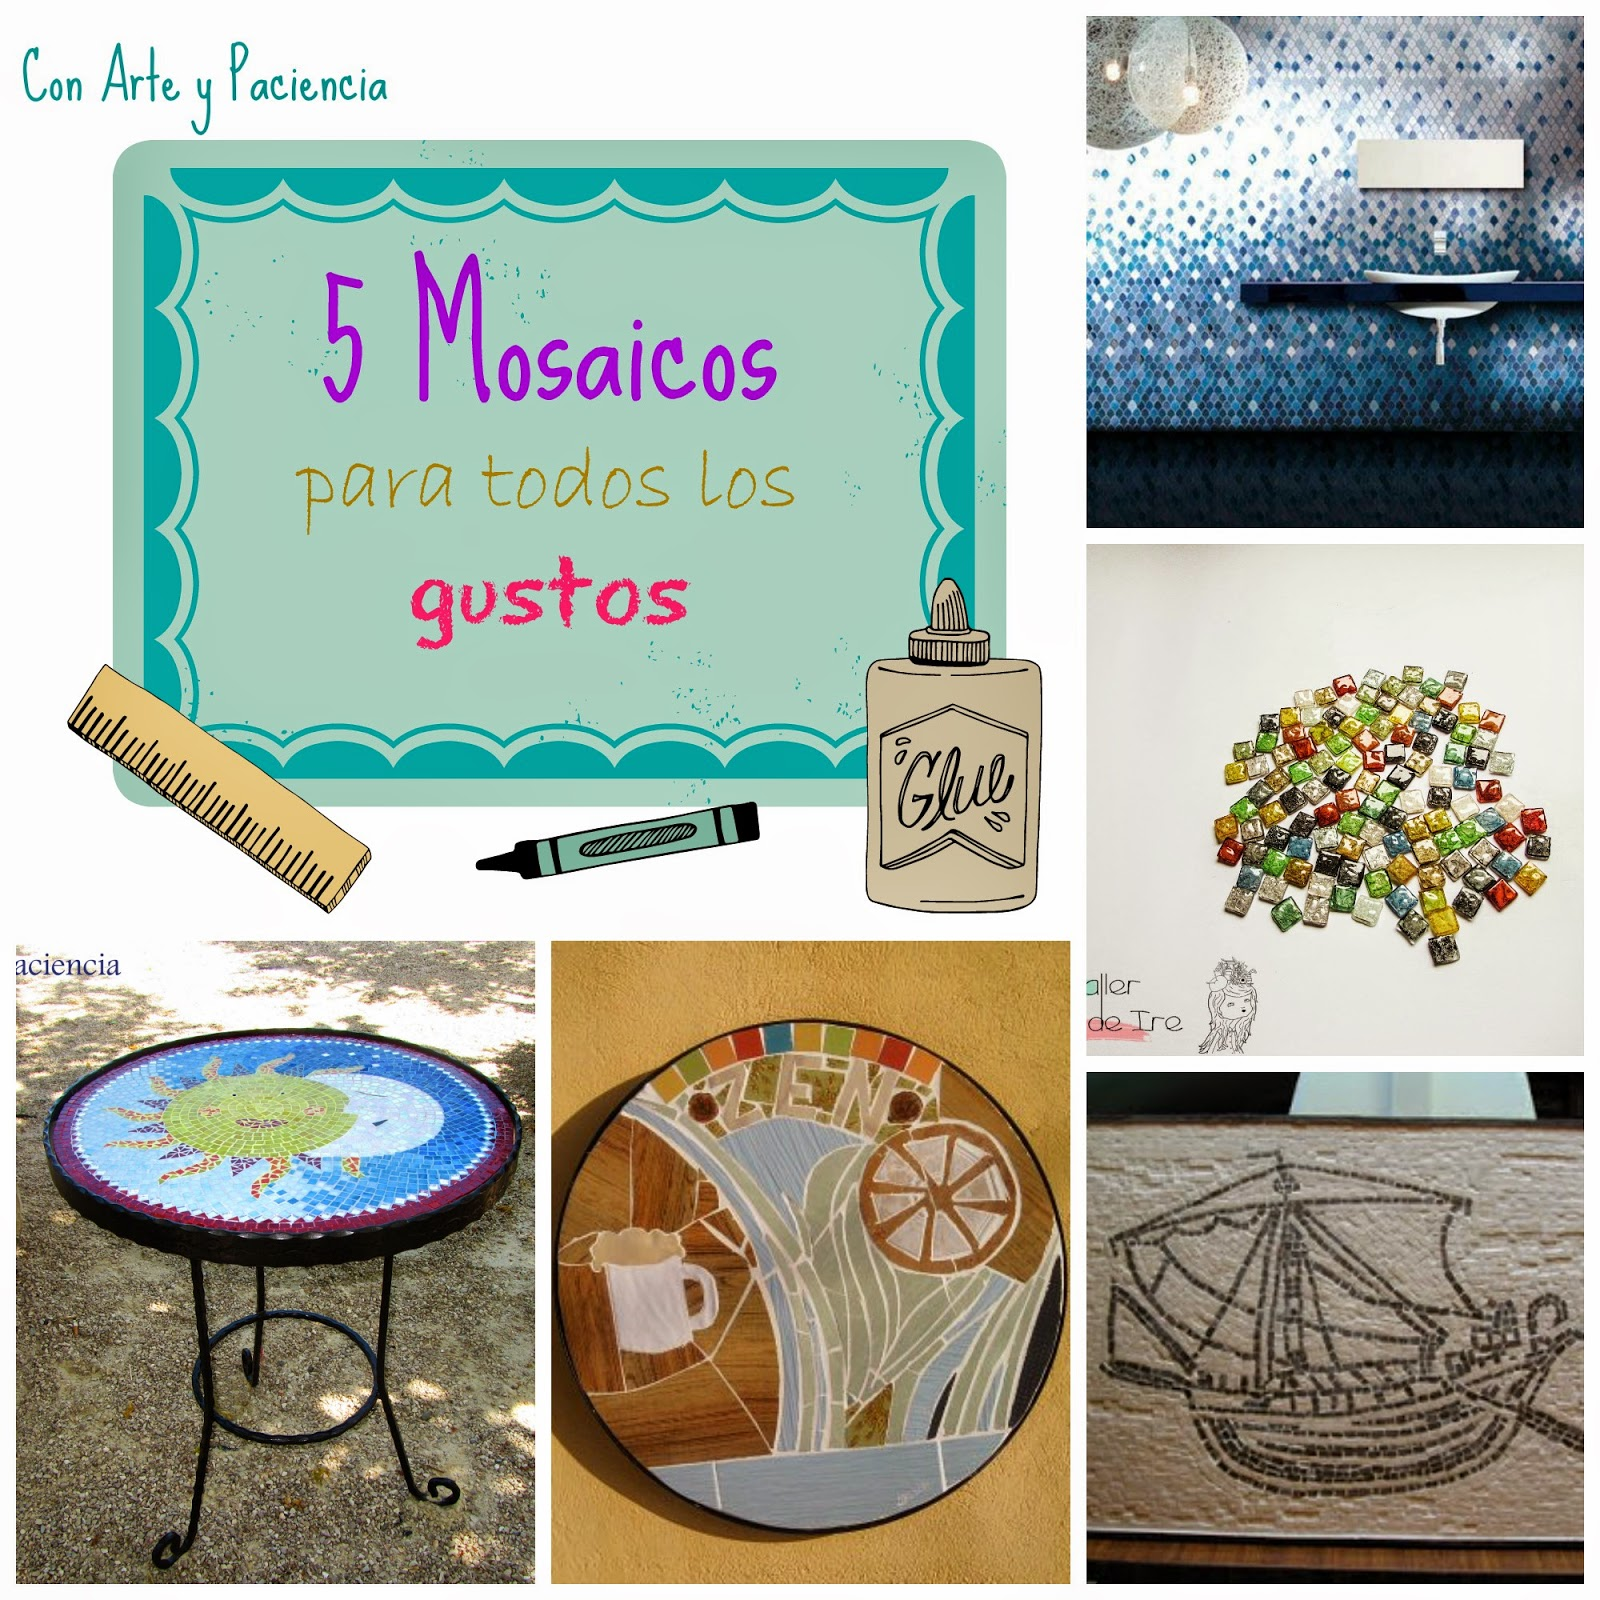 mosaicos,mosaics,diy,hechos,manoforja,madera,teselas,cristal,tiffany,rulina,cuadro,cd